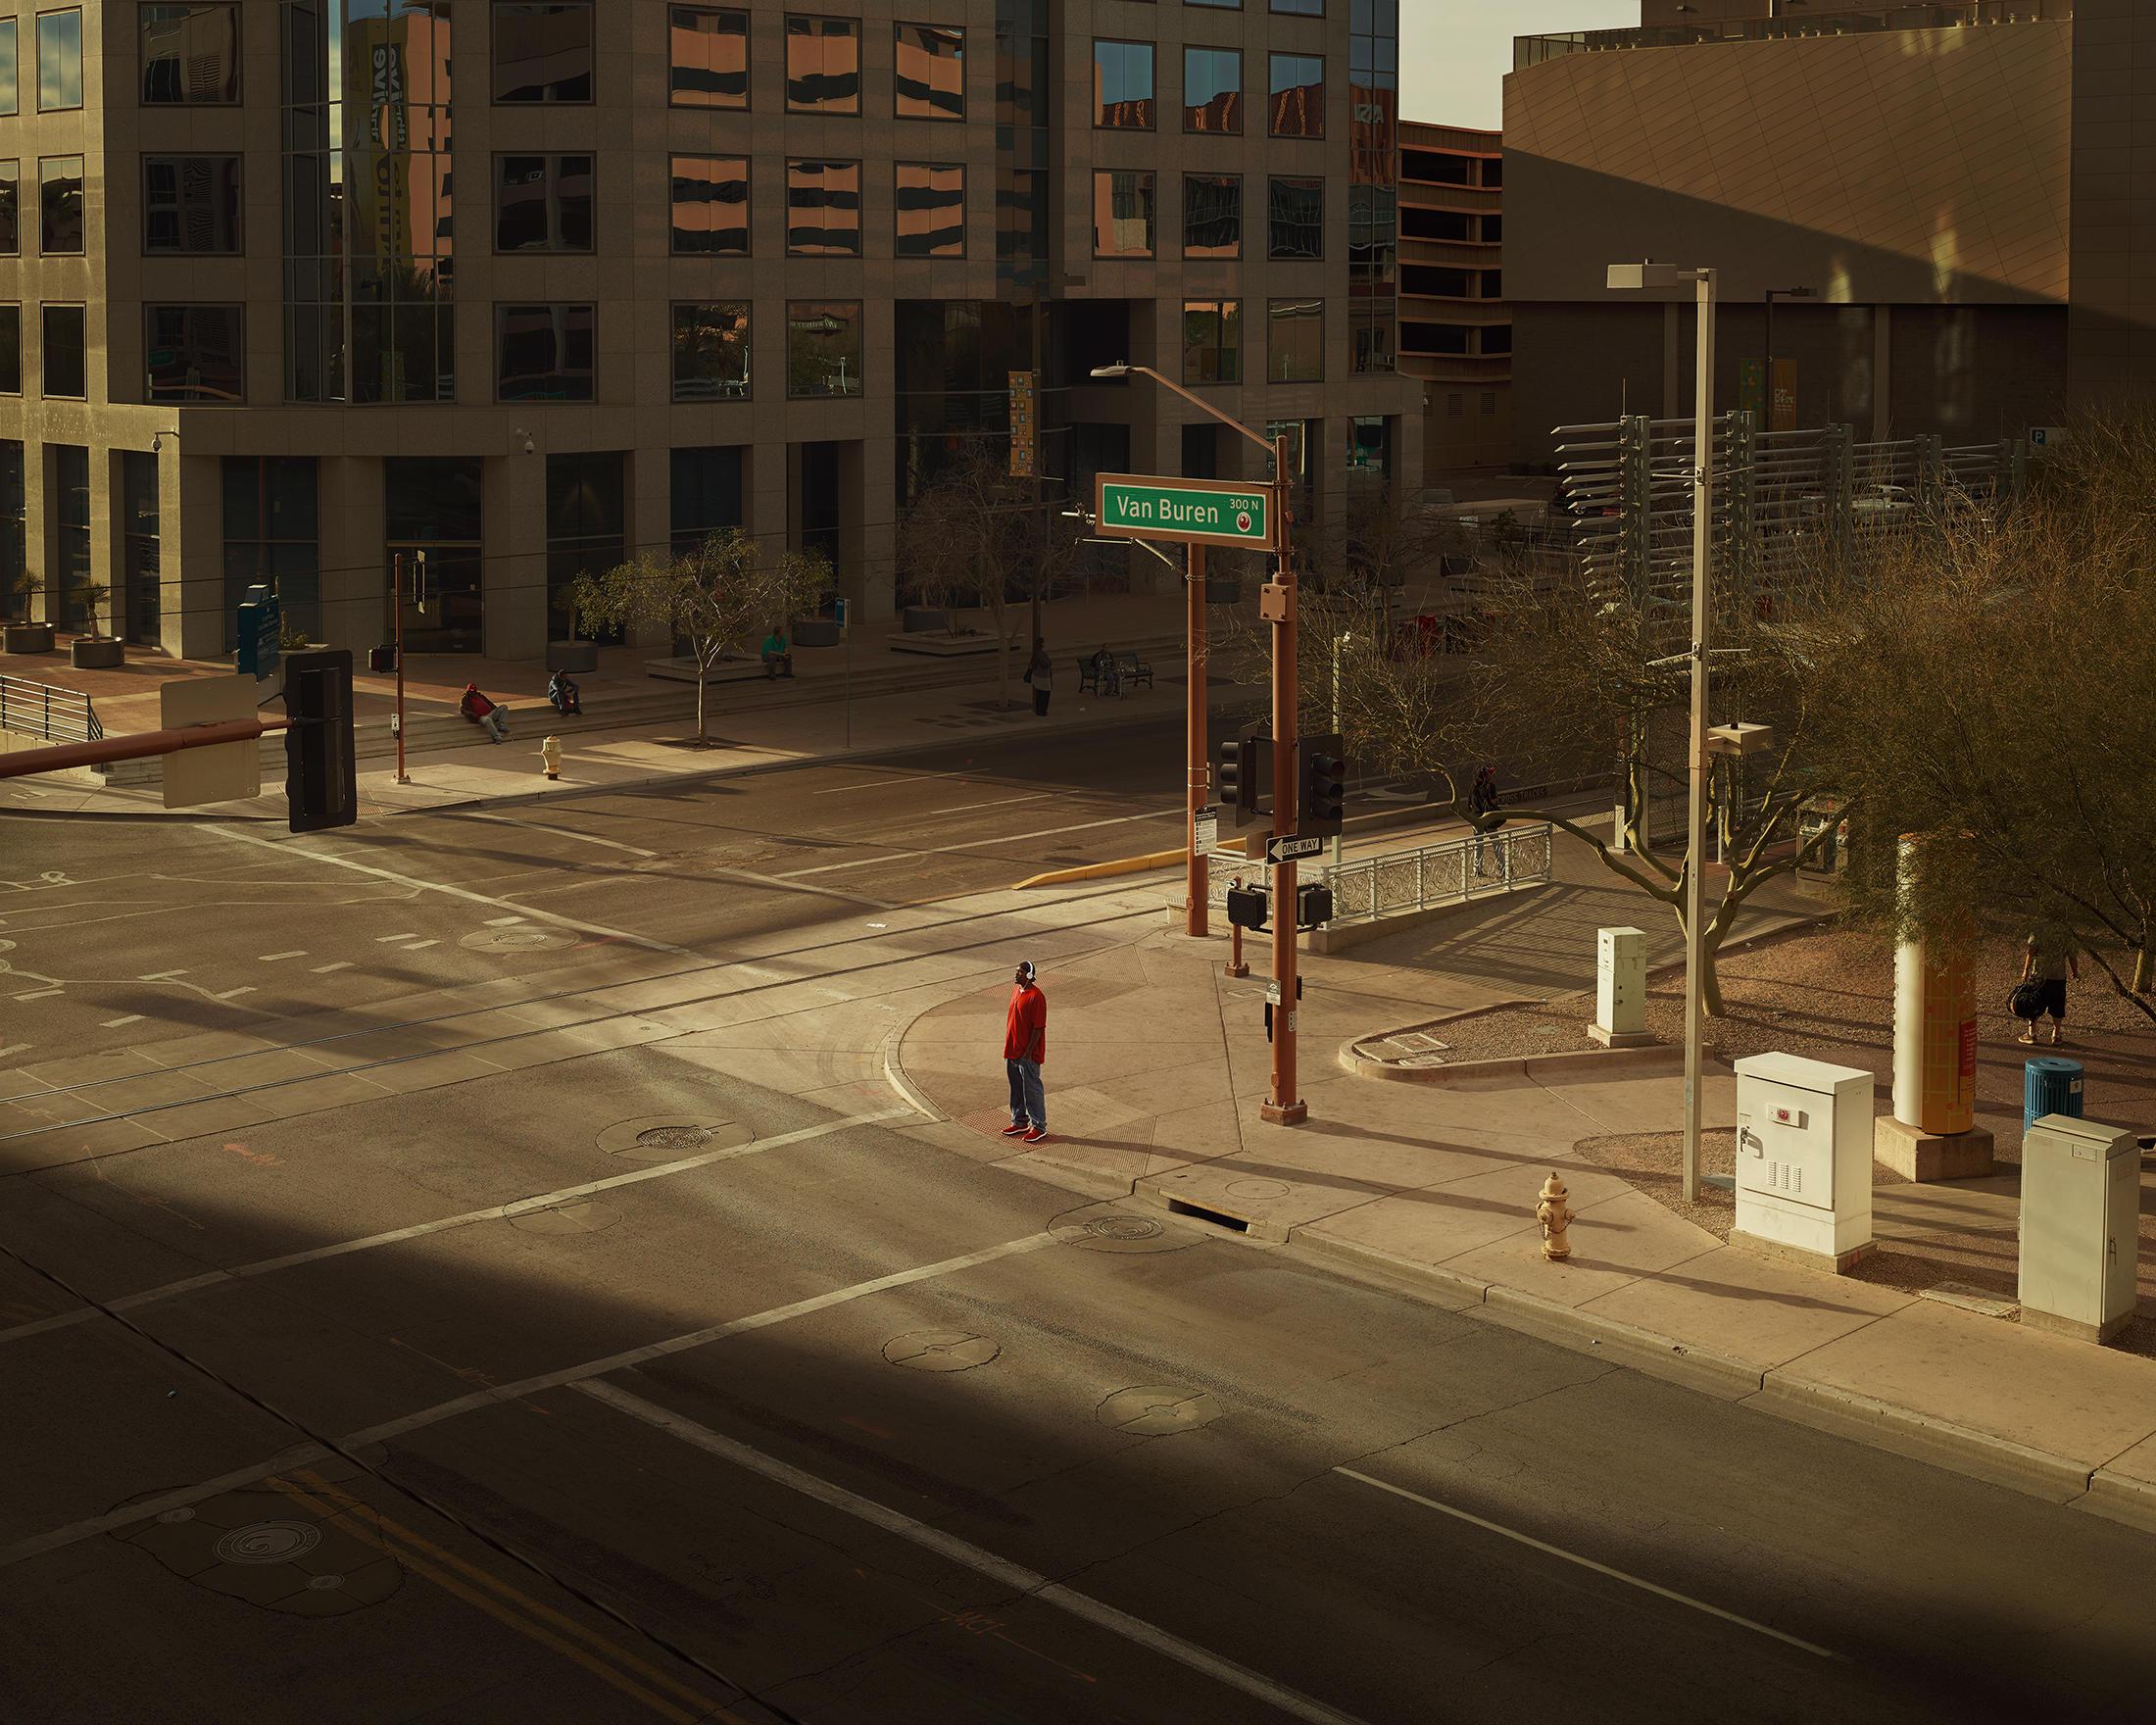 Oli_Kellett_3 - Van Buren Way, Phoenix.jpg